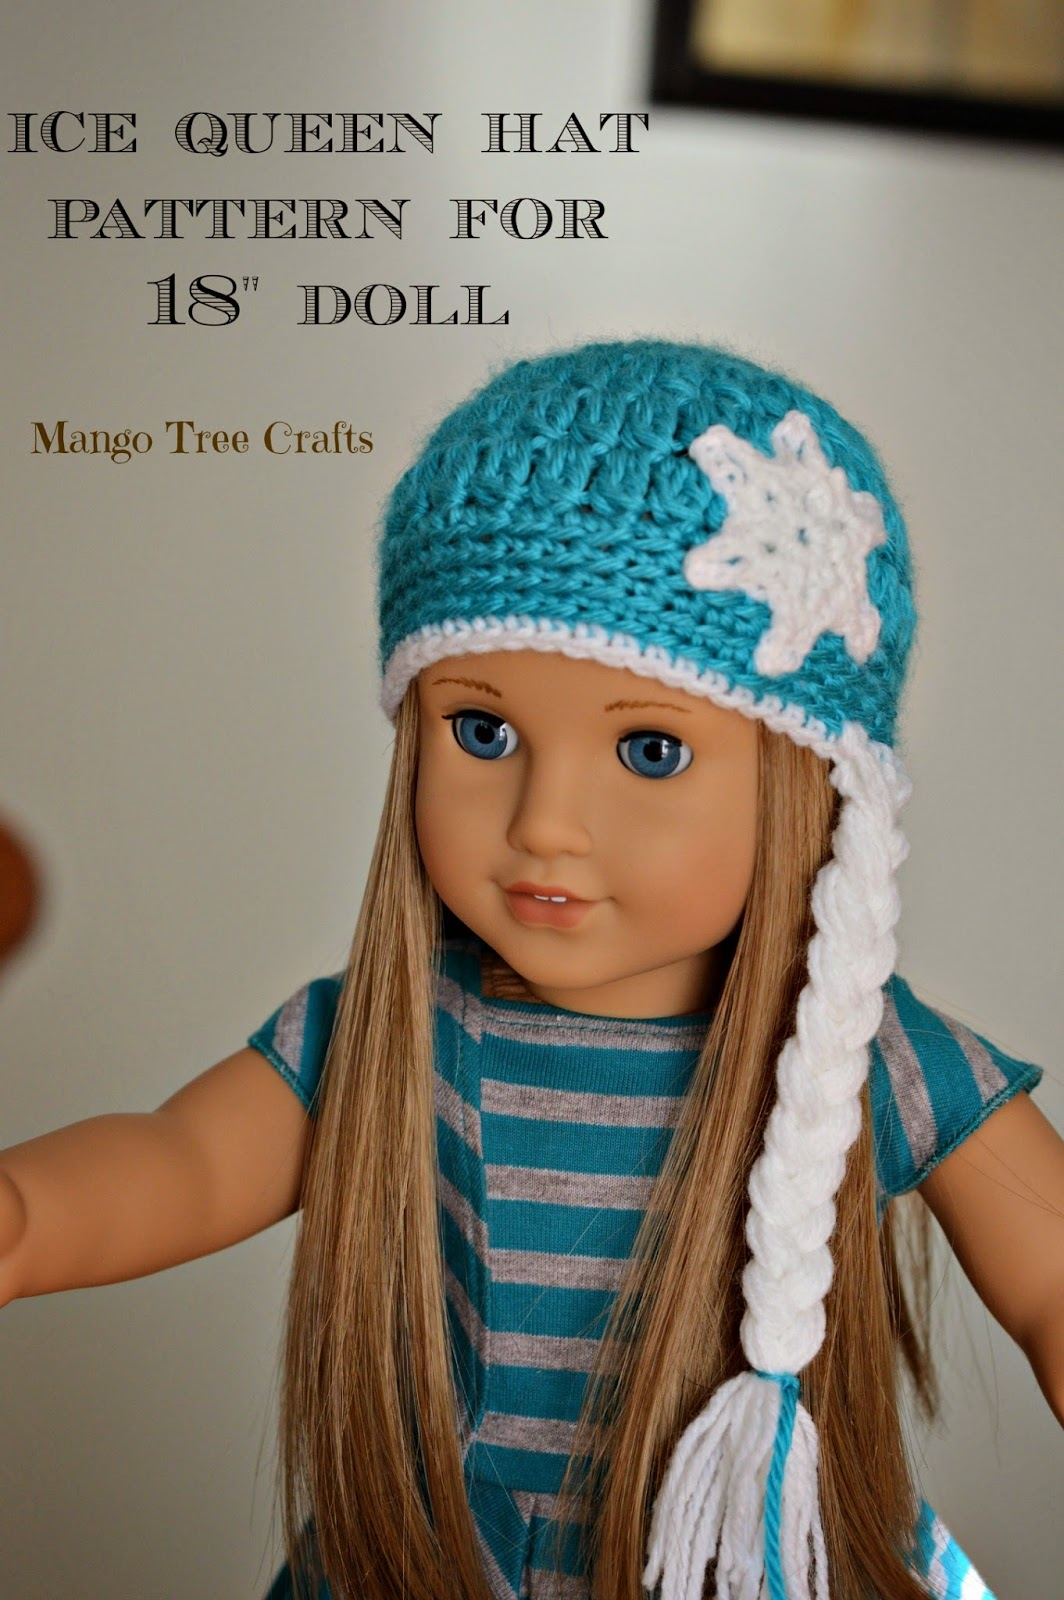 Crochet hat pattern for 18″ American Girl doll | 1600x1064